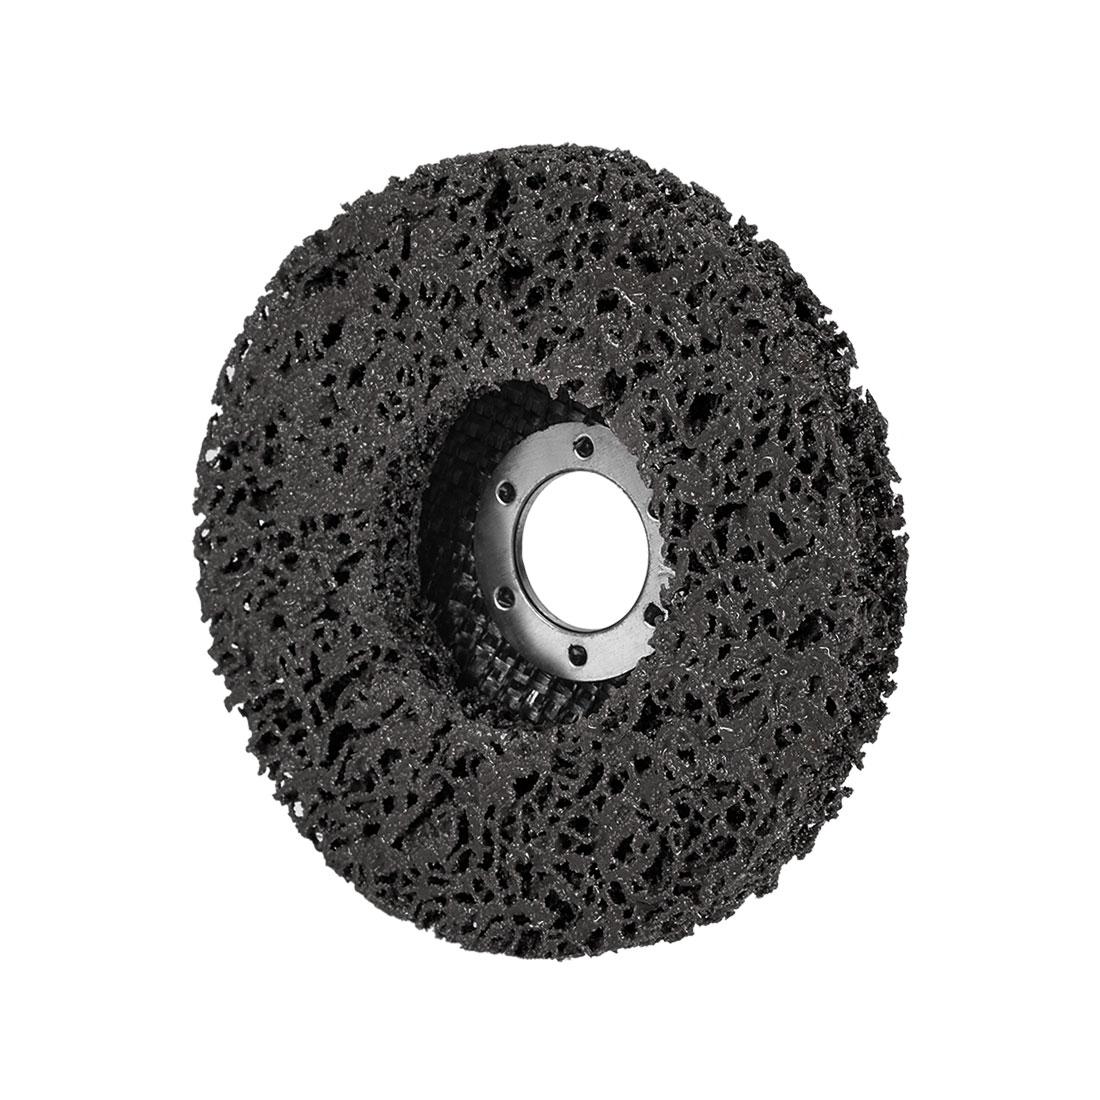 4.5 Inch Nylon Polishing Wheel Buffing Pad Felt Disc Black